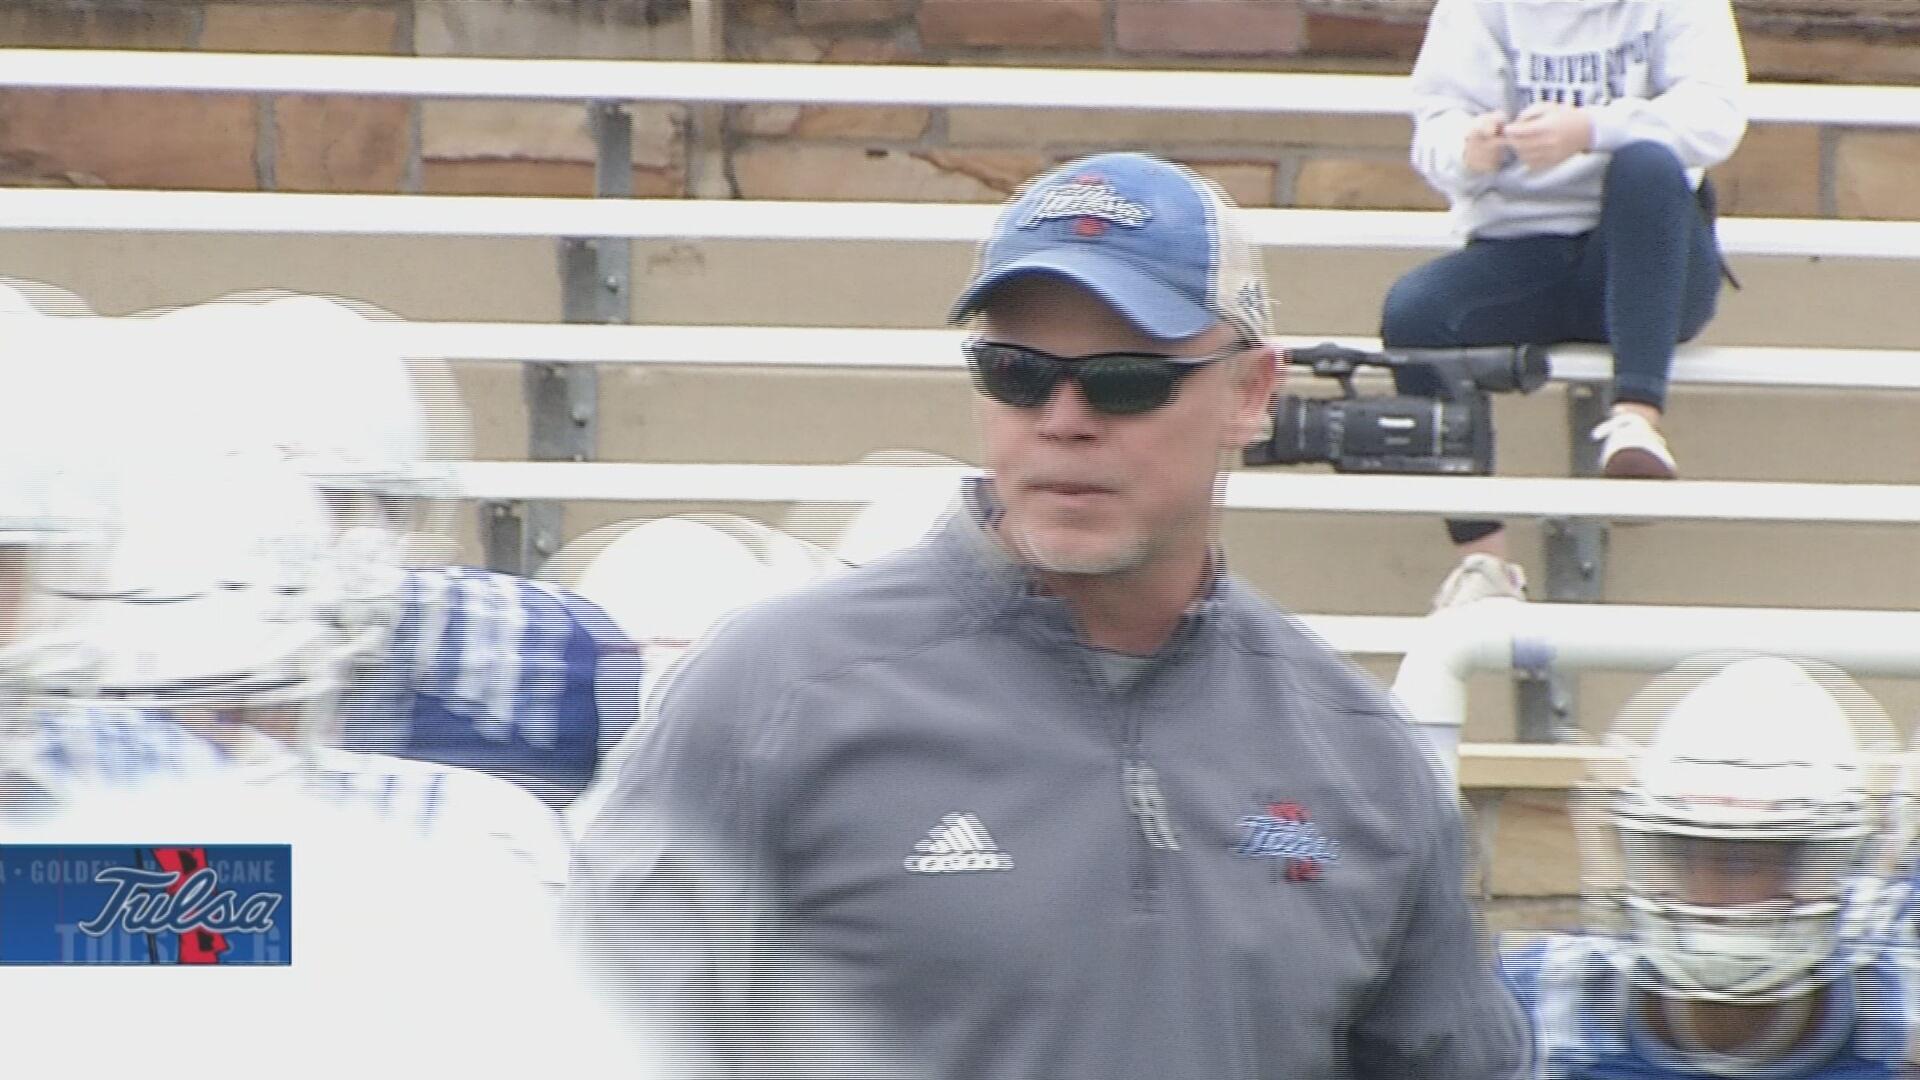 Despite Initial Delay, TU Head Coach Remains Optimistic To Play Full Season